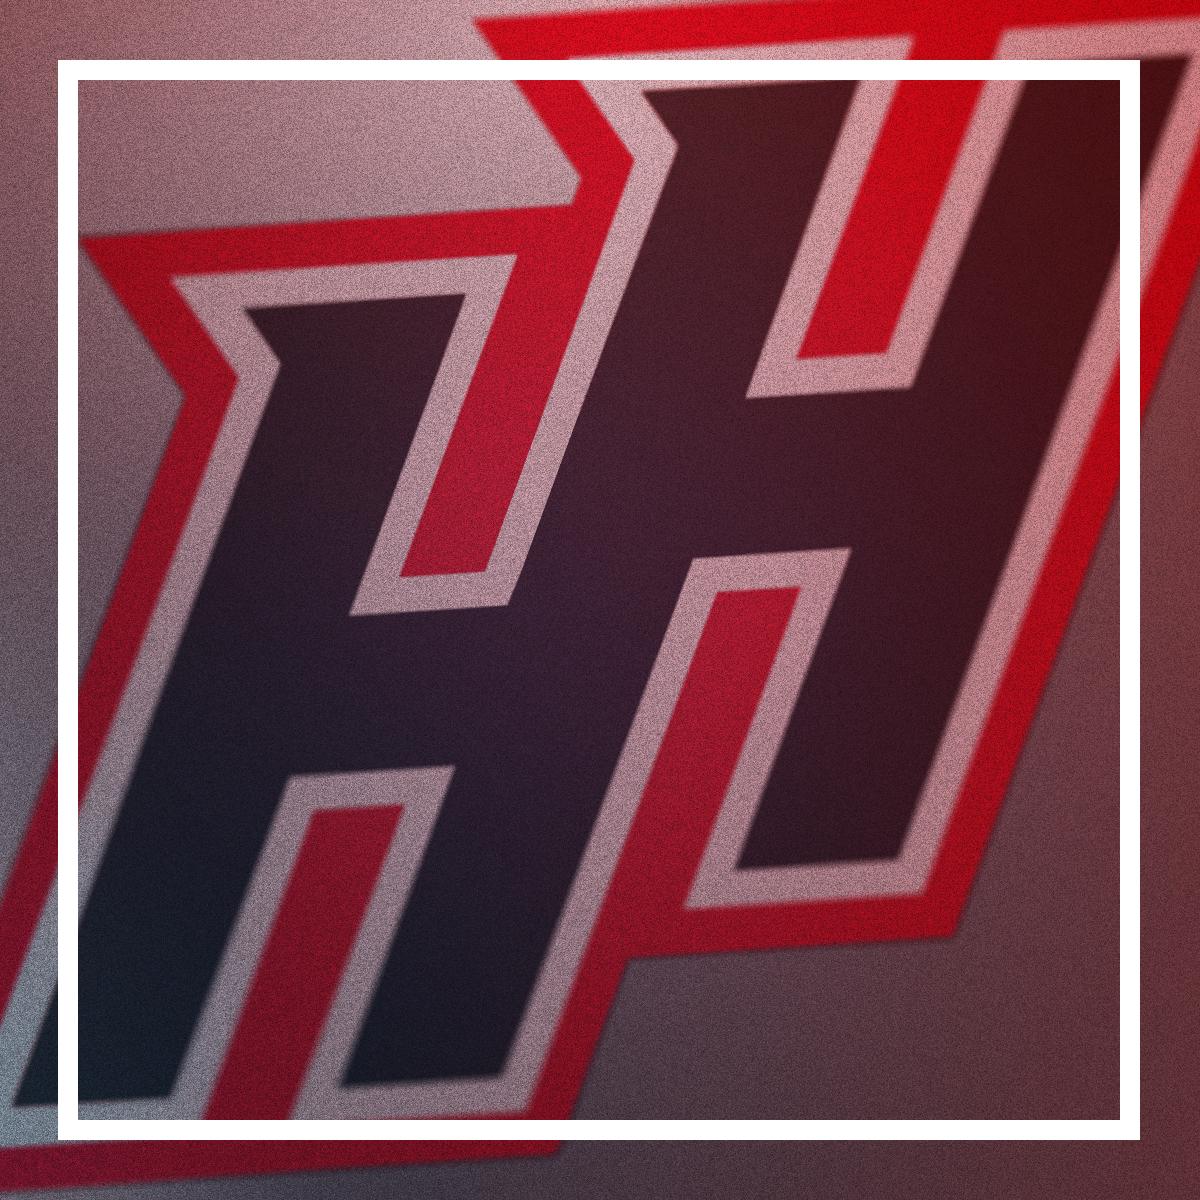 hhuskies_secondary_logo.png